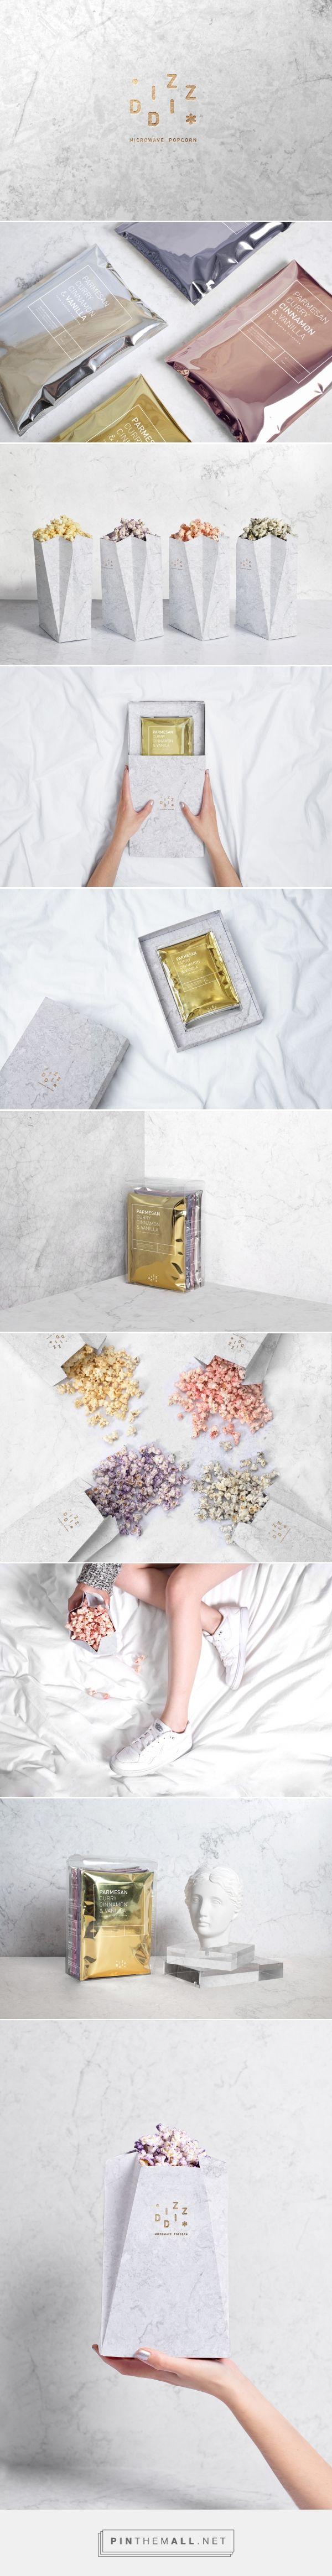 Diz-Diz Popcorn Packaging by Tatabi Studio on Behance | Fivestar Branding – Design and Branding Agency & Inspiration Gallery